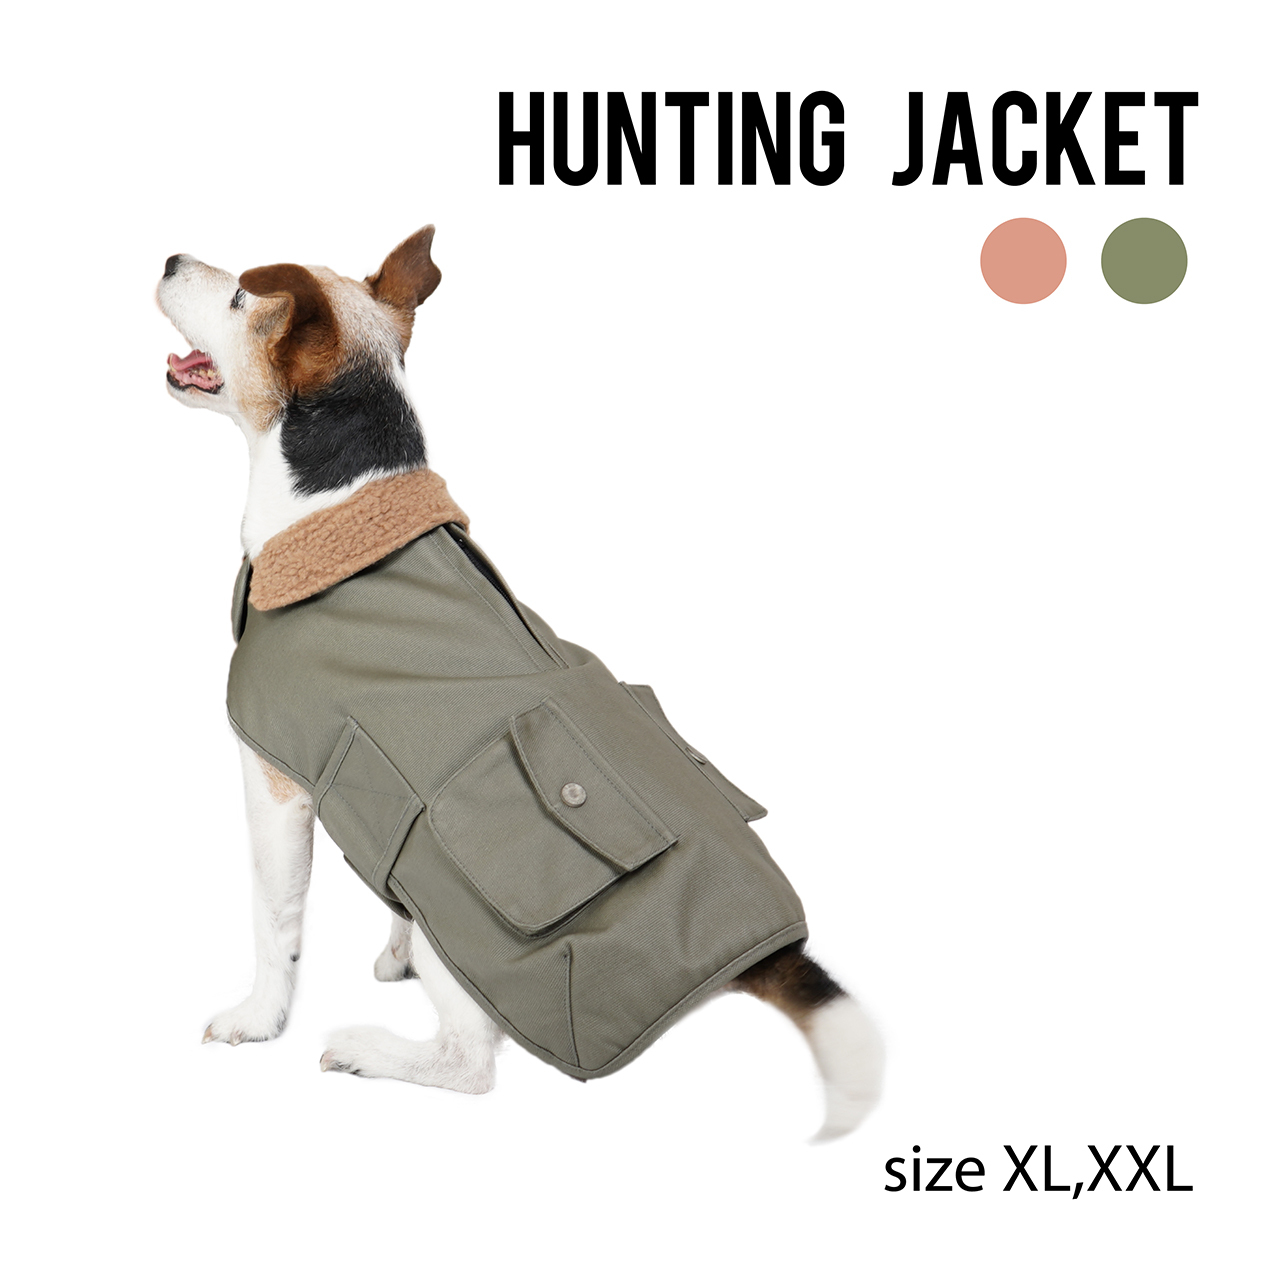 HUNTING JACKET(XL,XXL) ハンティングジャケット